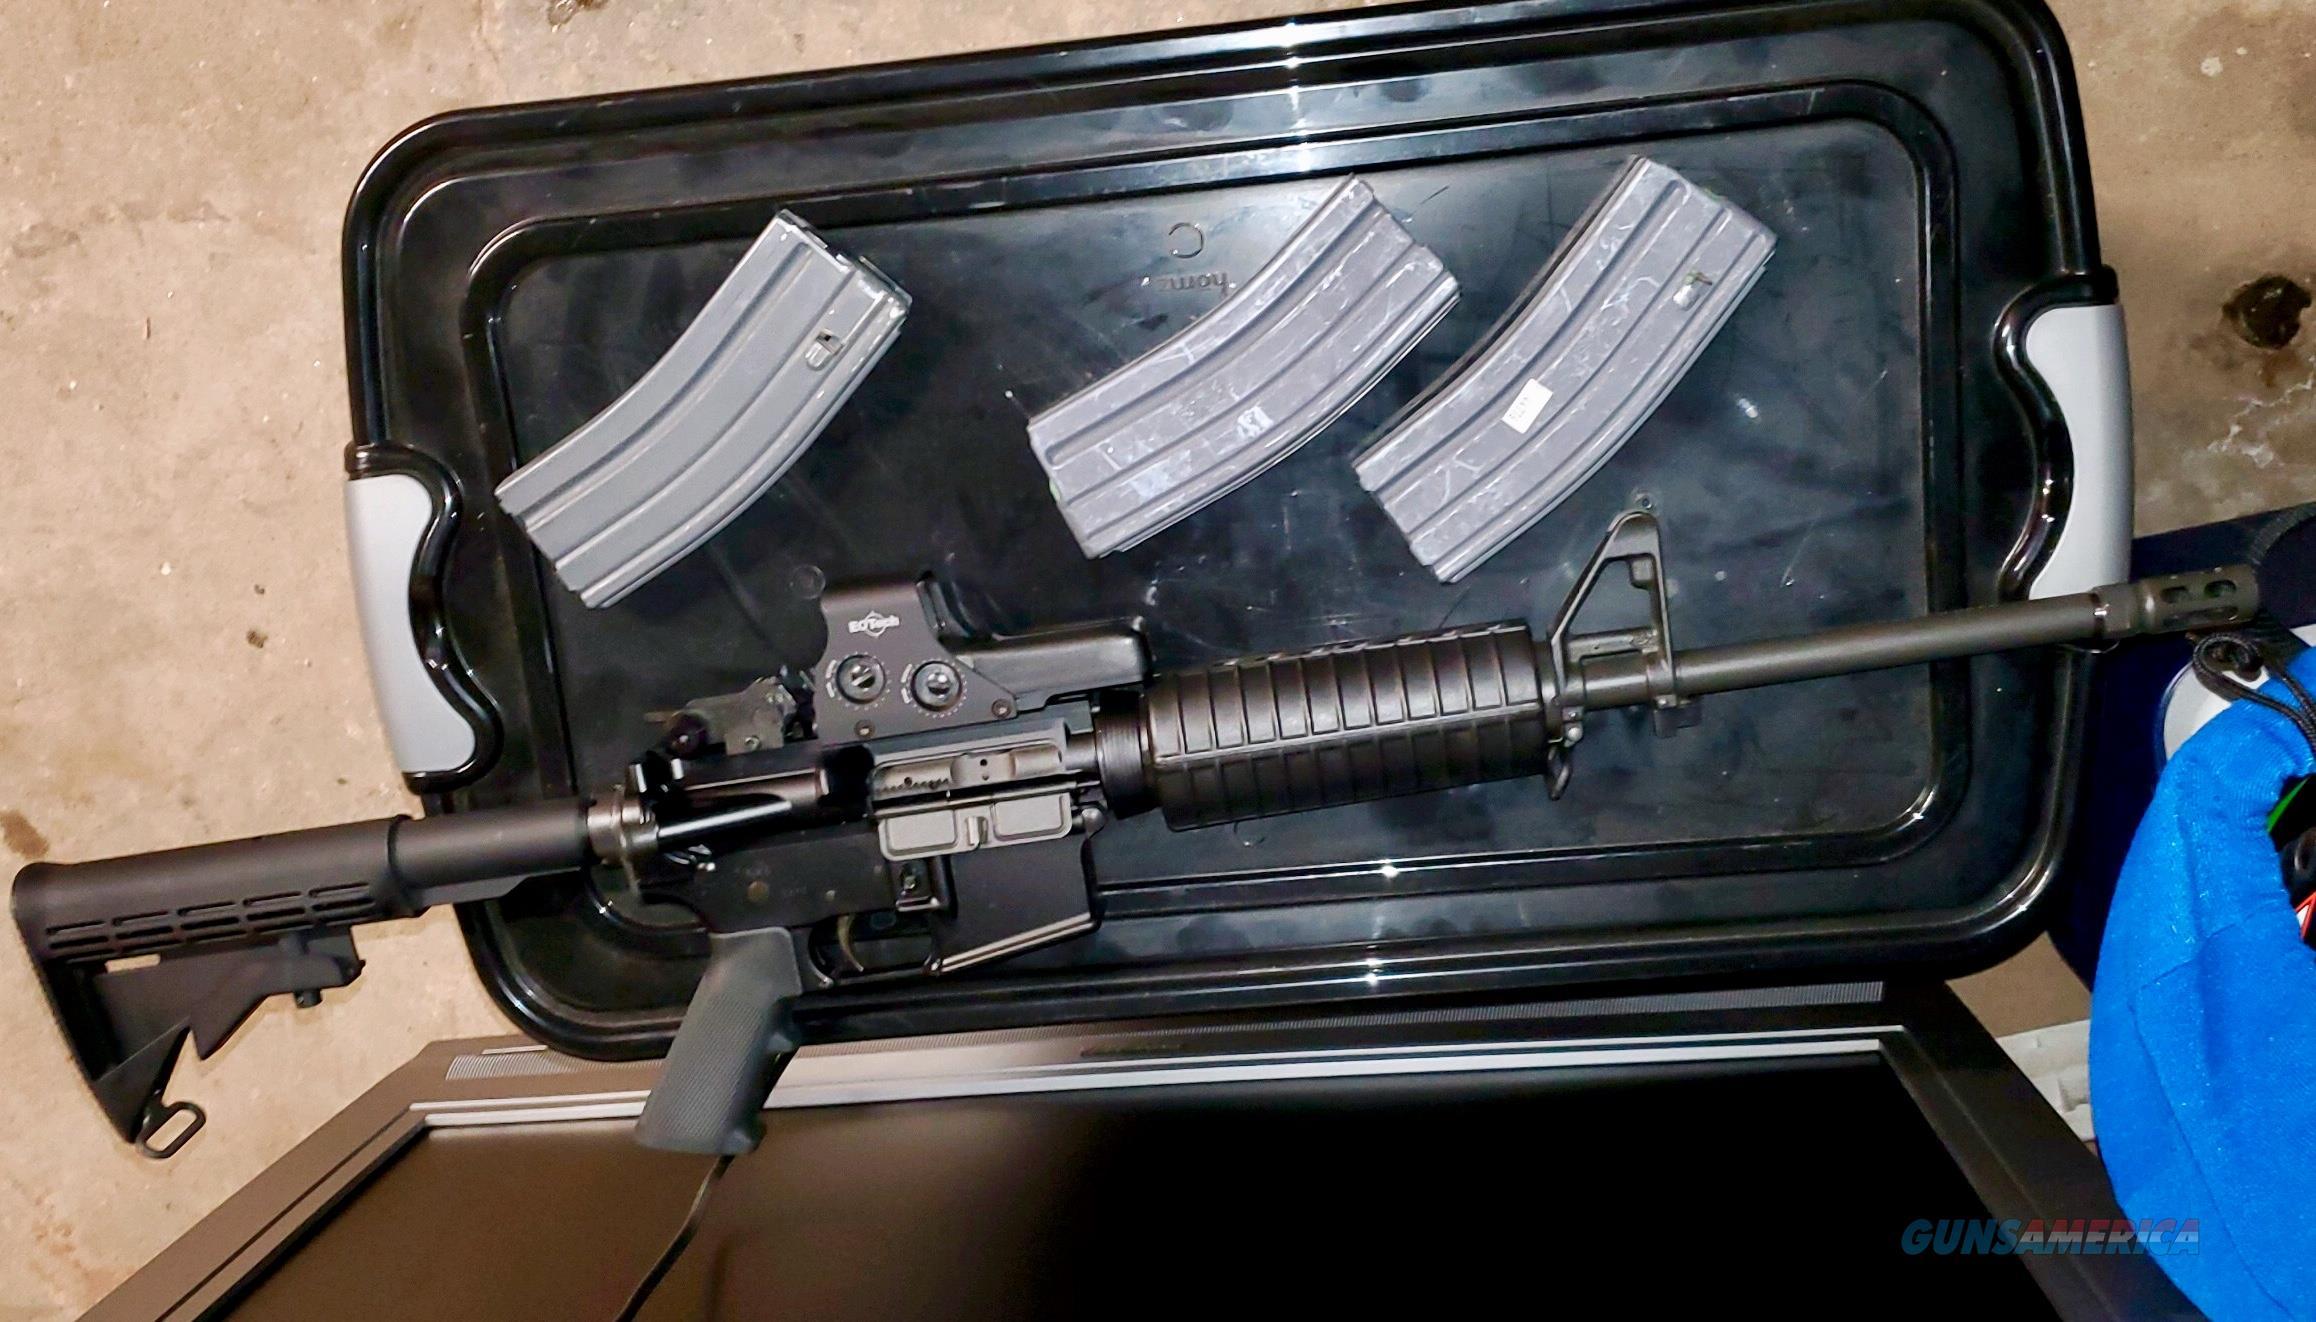 COLT - AR-15A3 Heavy Barrel W/ EOTECH Scope-  Guns > Rifles > Colt Military/Tactical Rifles